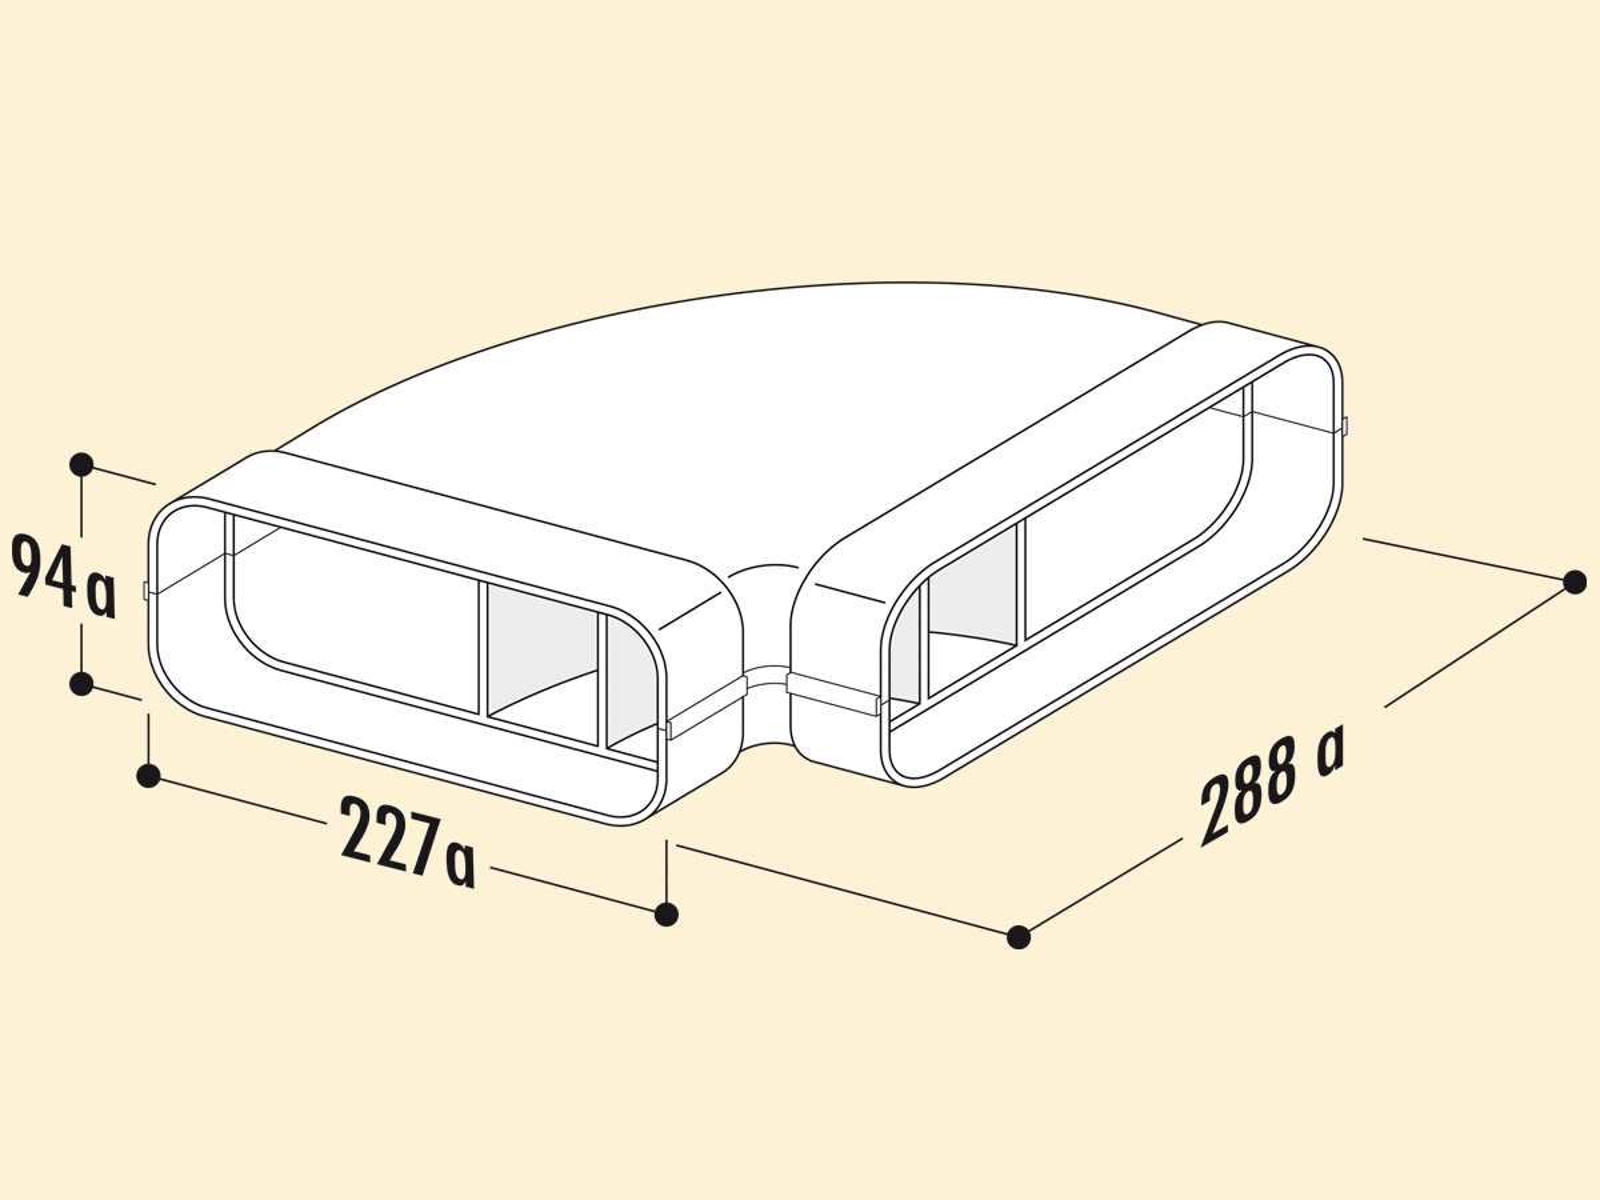 Compair 404.3.003 F-RBH 90 Rohrbogen horizontal 90°